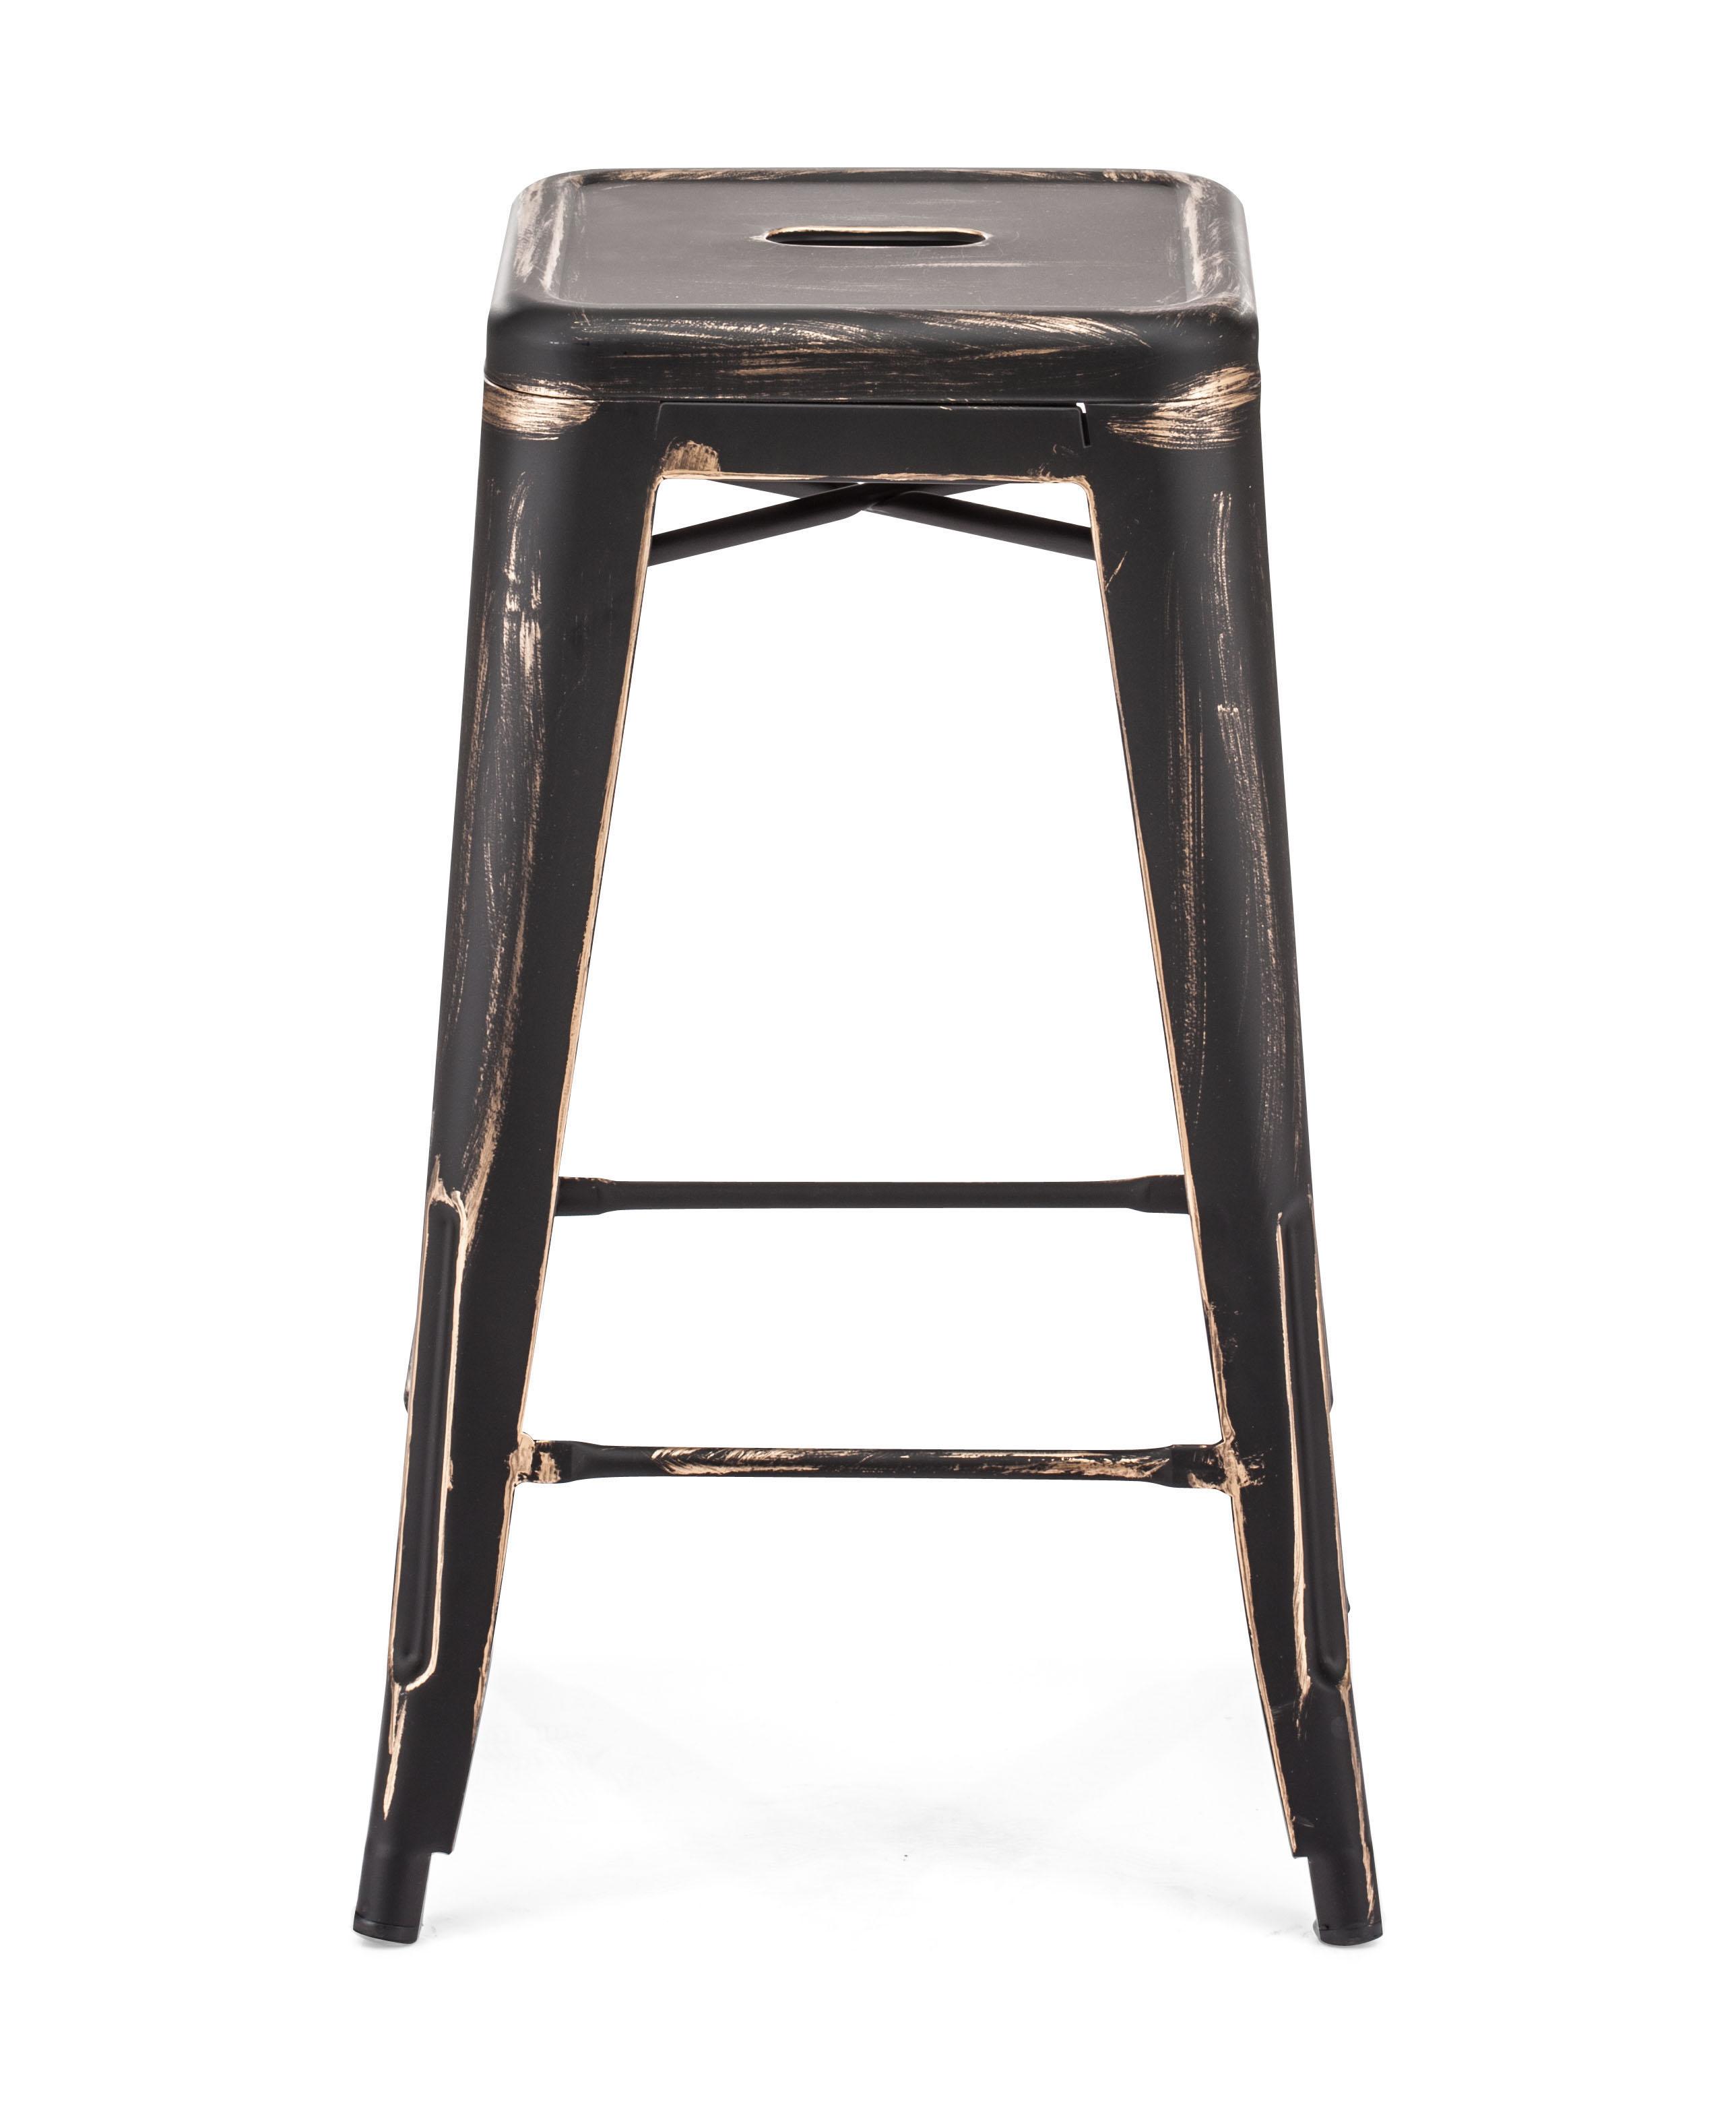 Marvelous Zuo Modern Marius Counter Stool Creativecarmelina Interior Chair Design Creativecarmelinacom